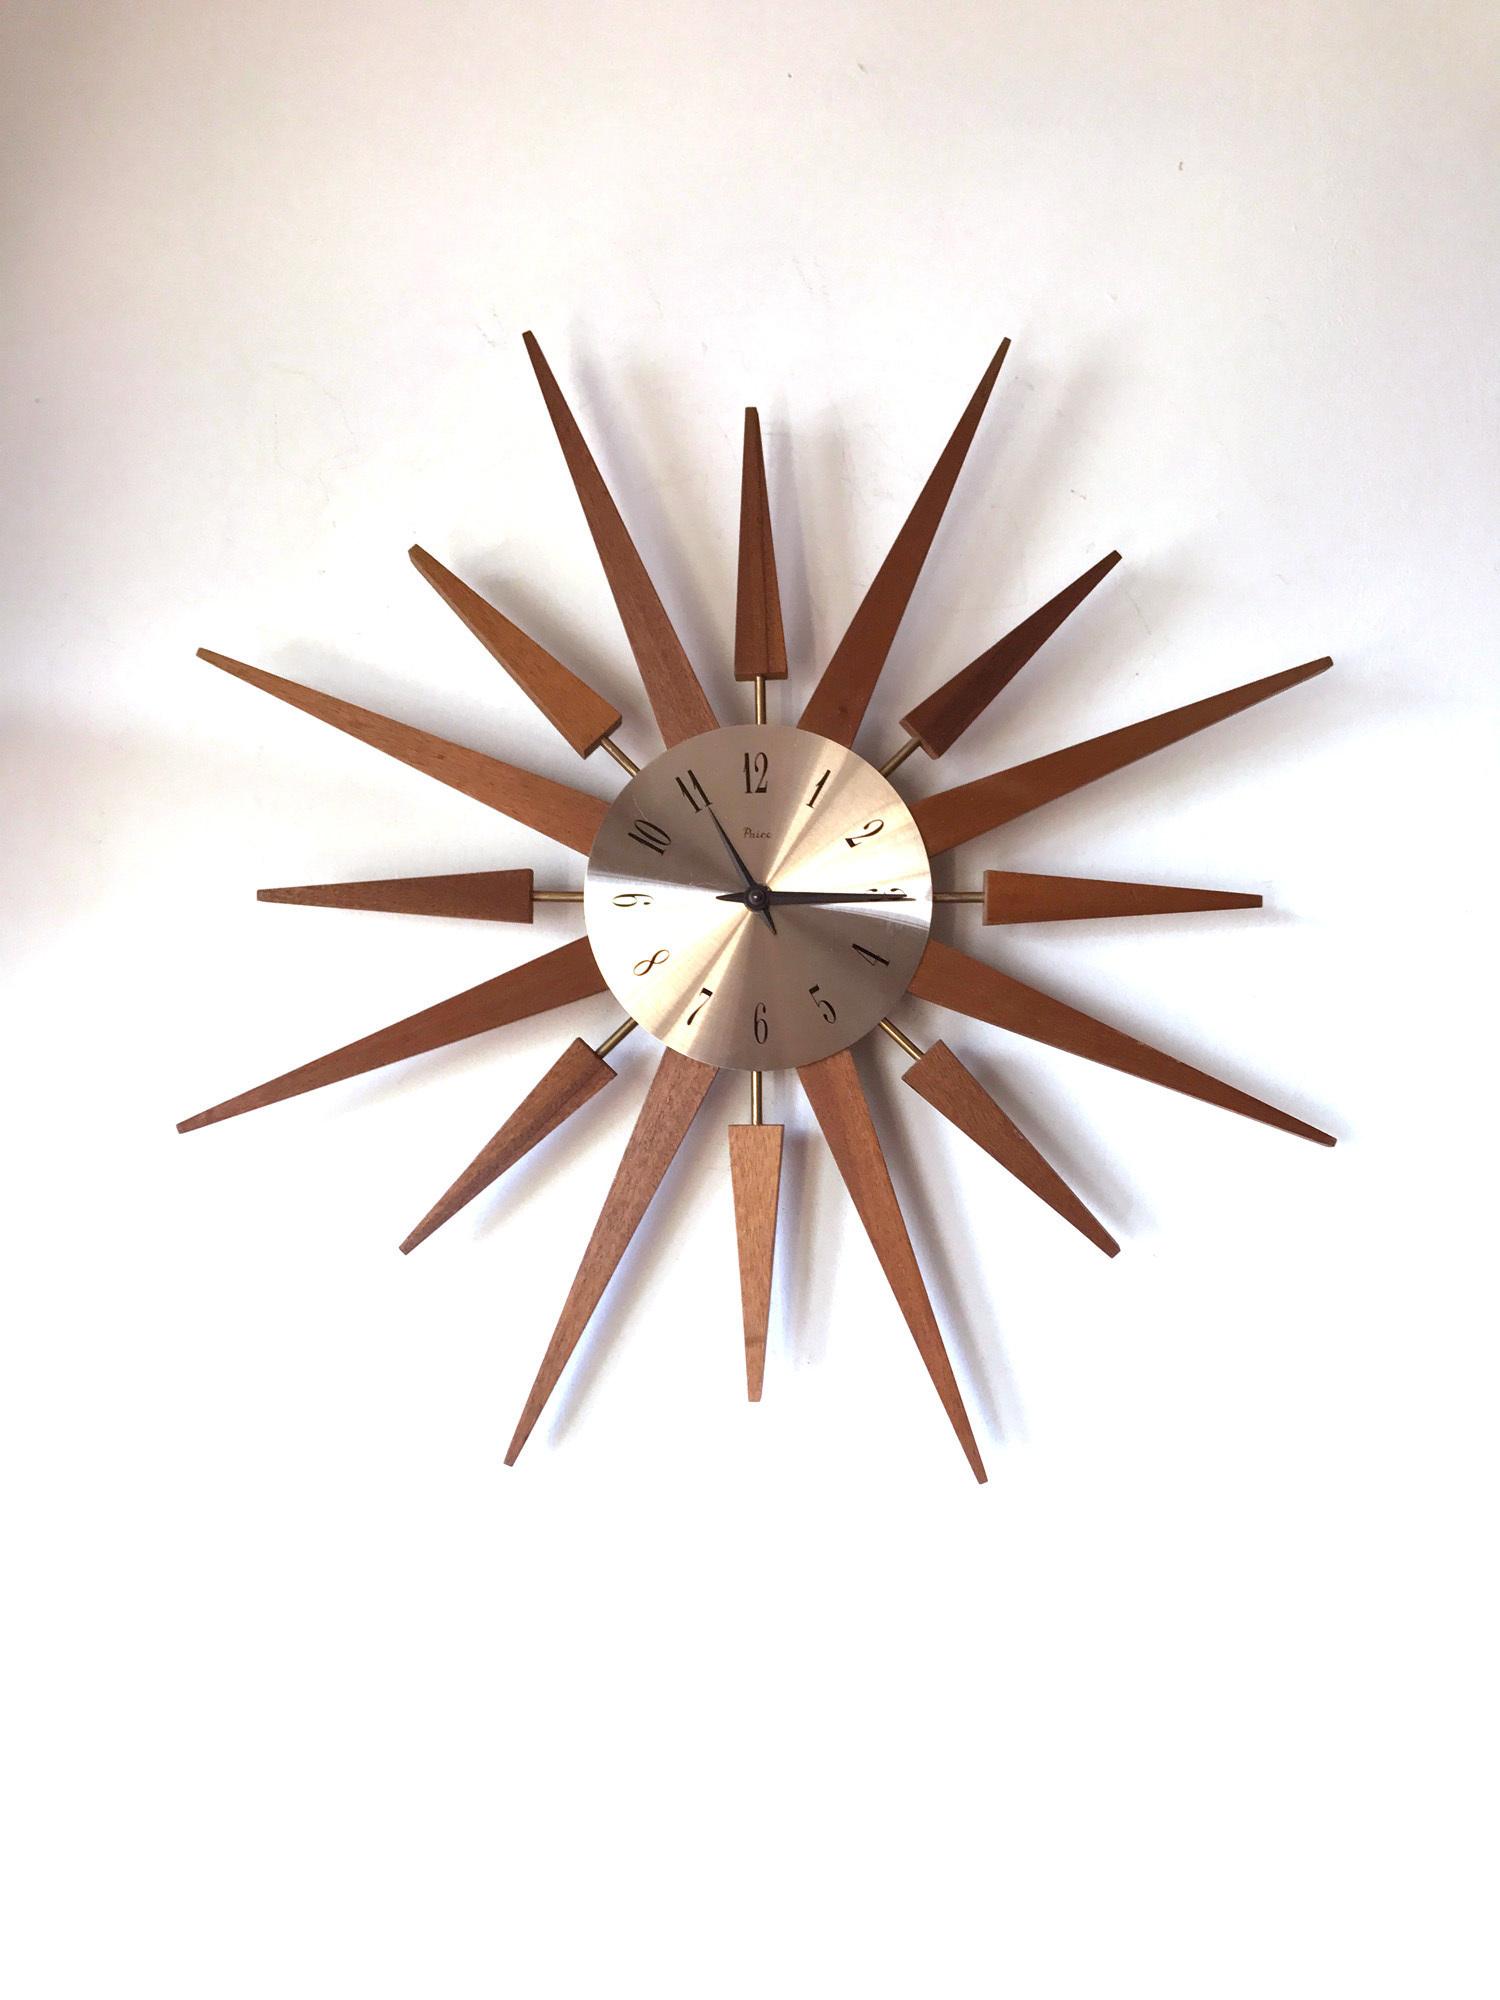 60s Stylish Vintage Retro Teak Paico Sunburst Starburst Wall Clock